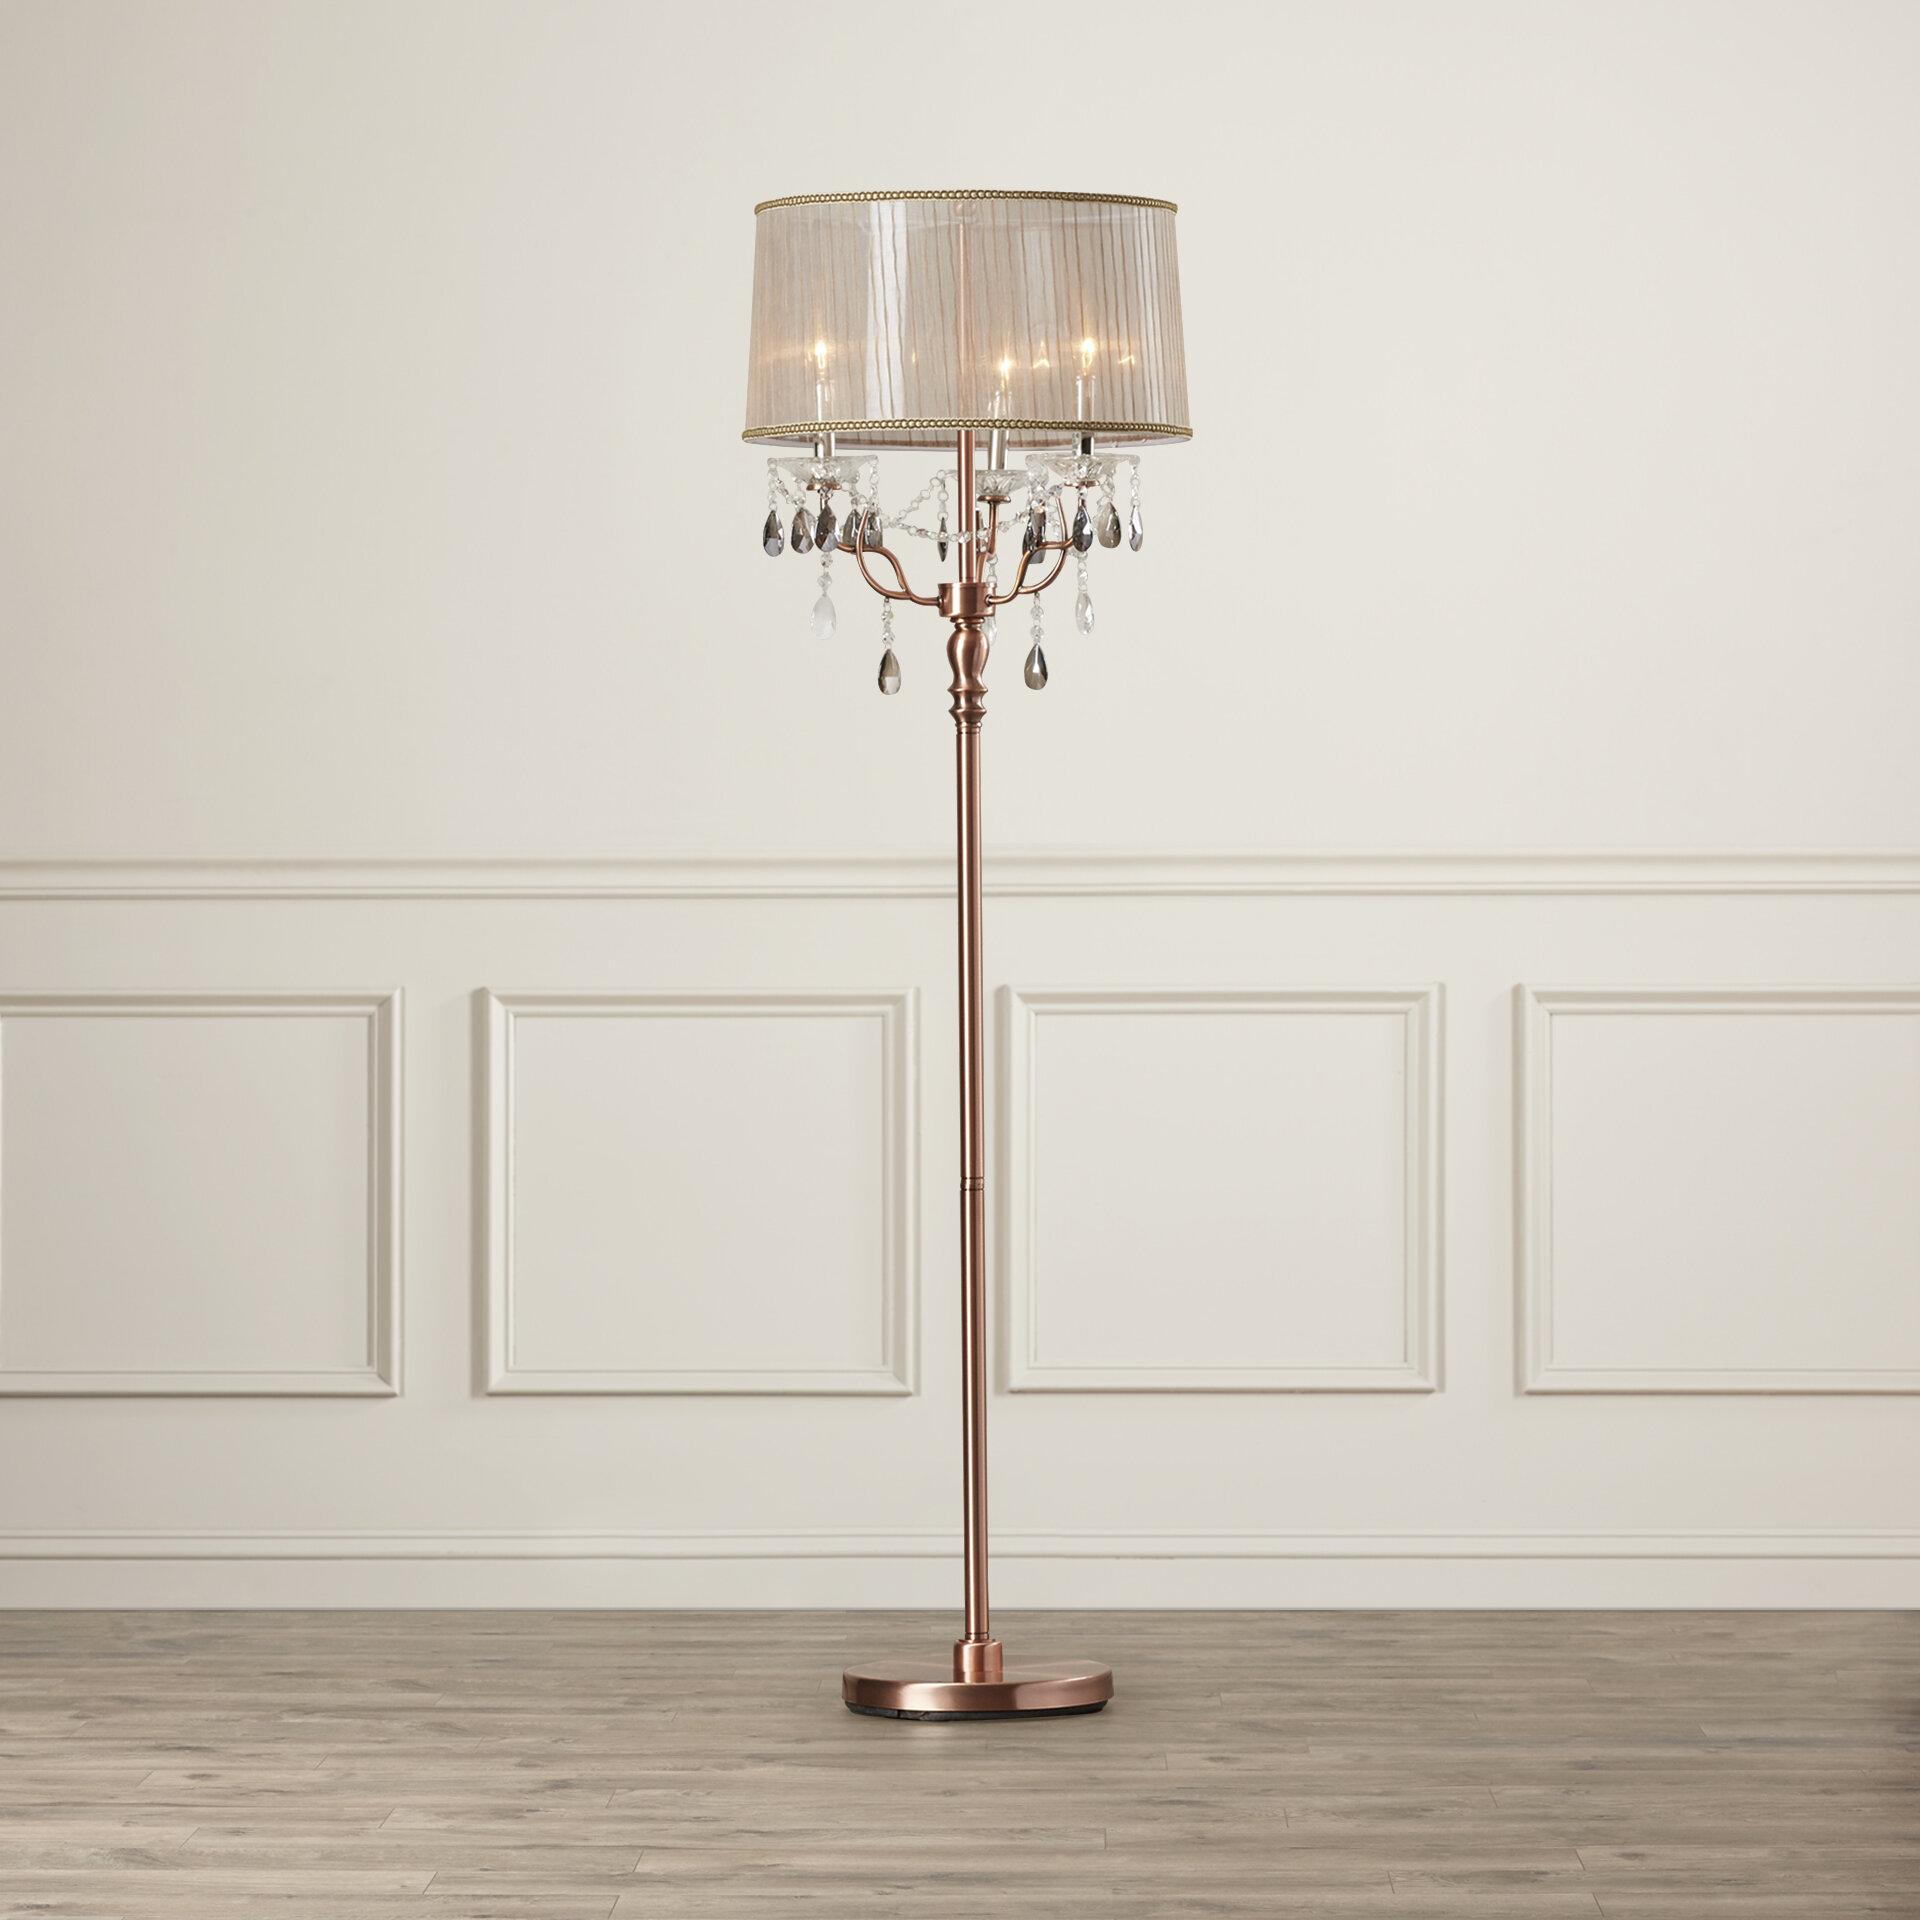 Willa Arlo Interiors Letizia 62 Candelabra Floor Lamp Reviews Wayfair